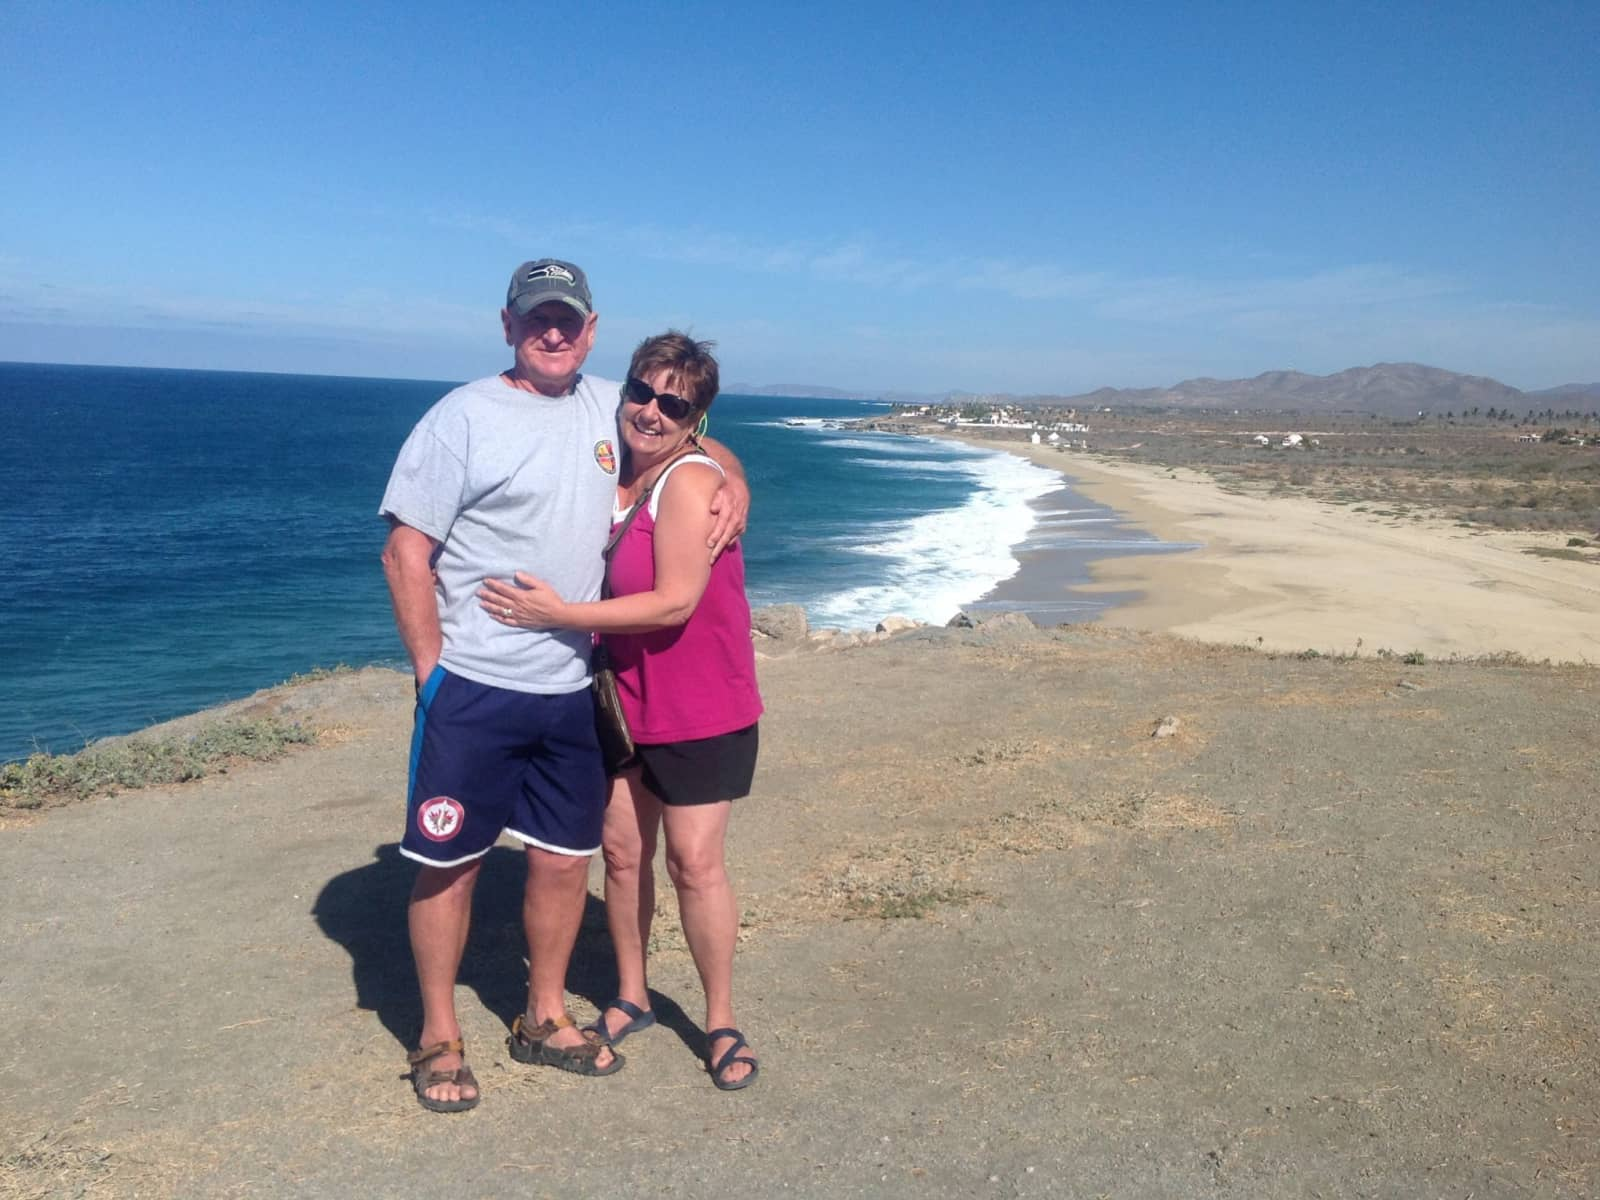 Brenda & keith & Keith from Thompson, Manitoba, Canada